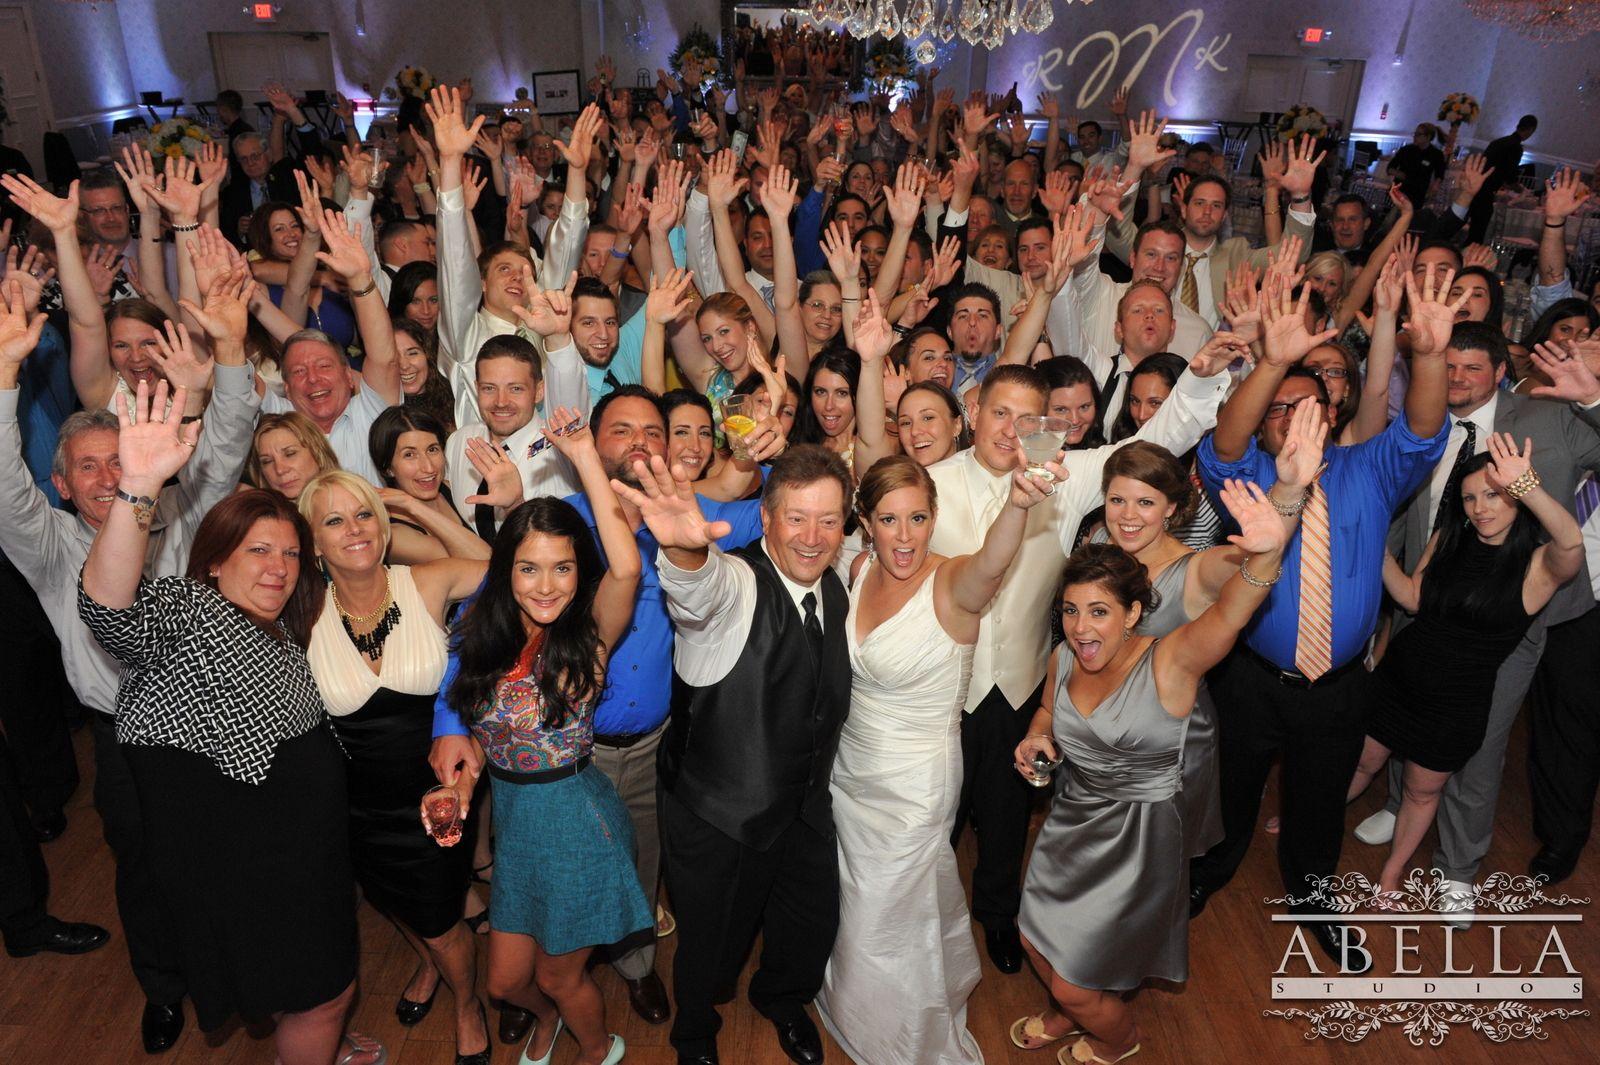 I think it's safe to say, this wedding was a ton of fun! Everyone danced the night away at the Crystal Ballroom. www.CrystalBallroomNJ.com. Photo courtesy of Abella Studios. #bride #groom #wedding #marriage #CrystalBallroom #NJWeddings #CentralNJWedding #freeholdnj #nj #weddingdress #husband #wife #banquethall #venue